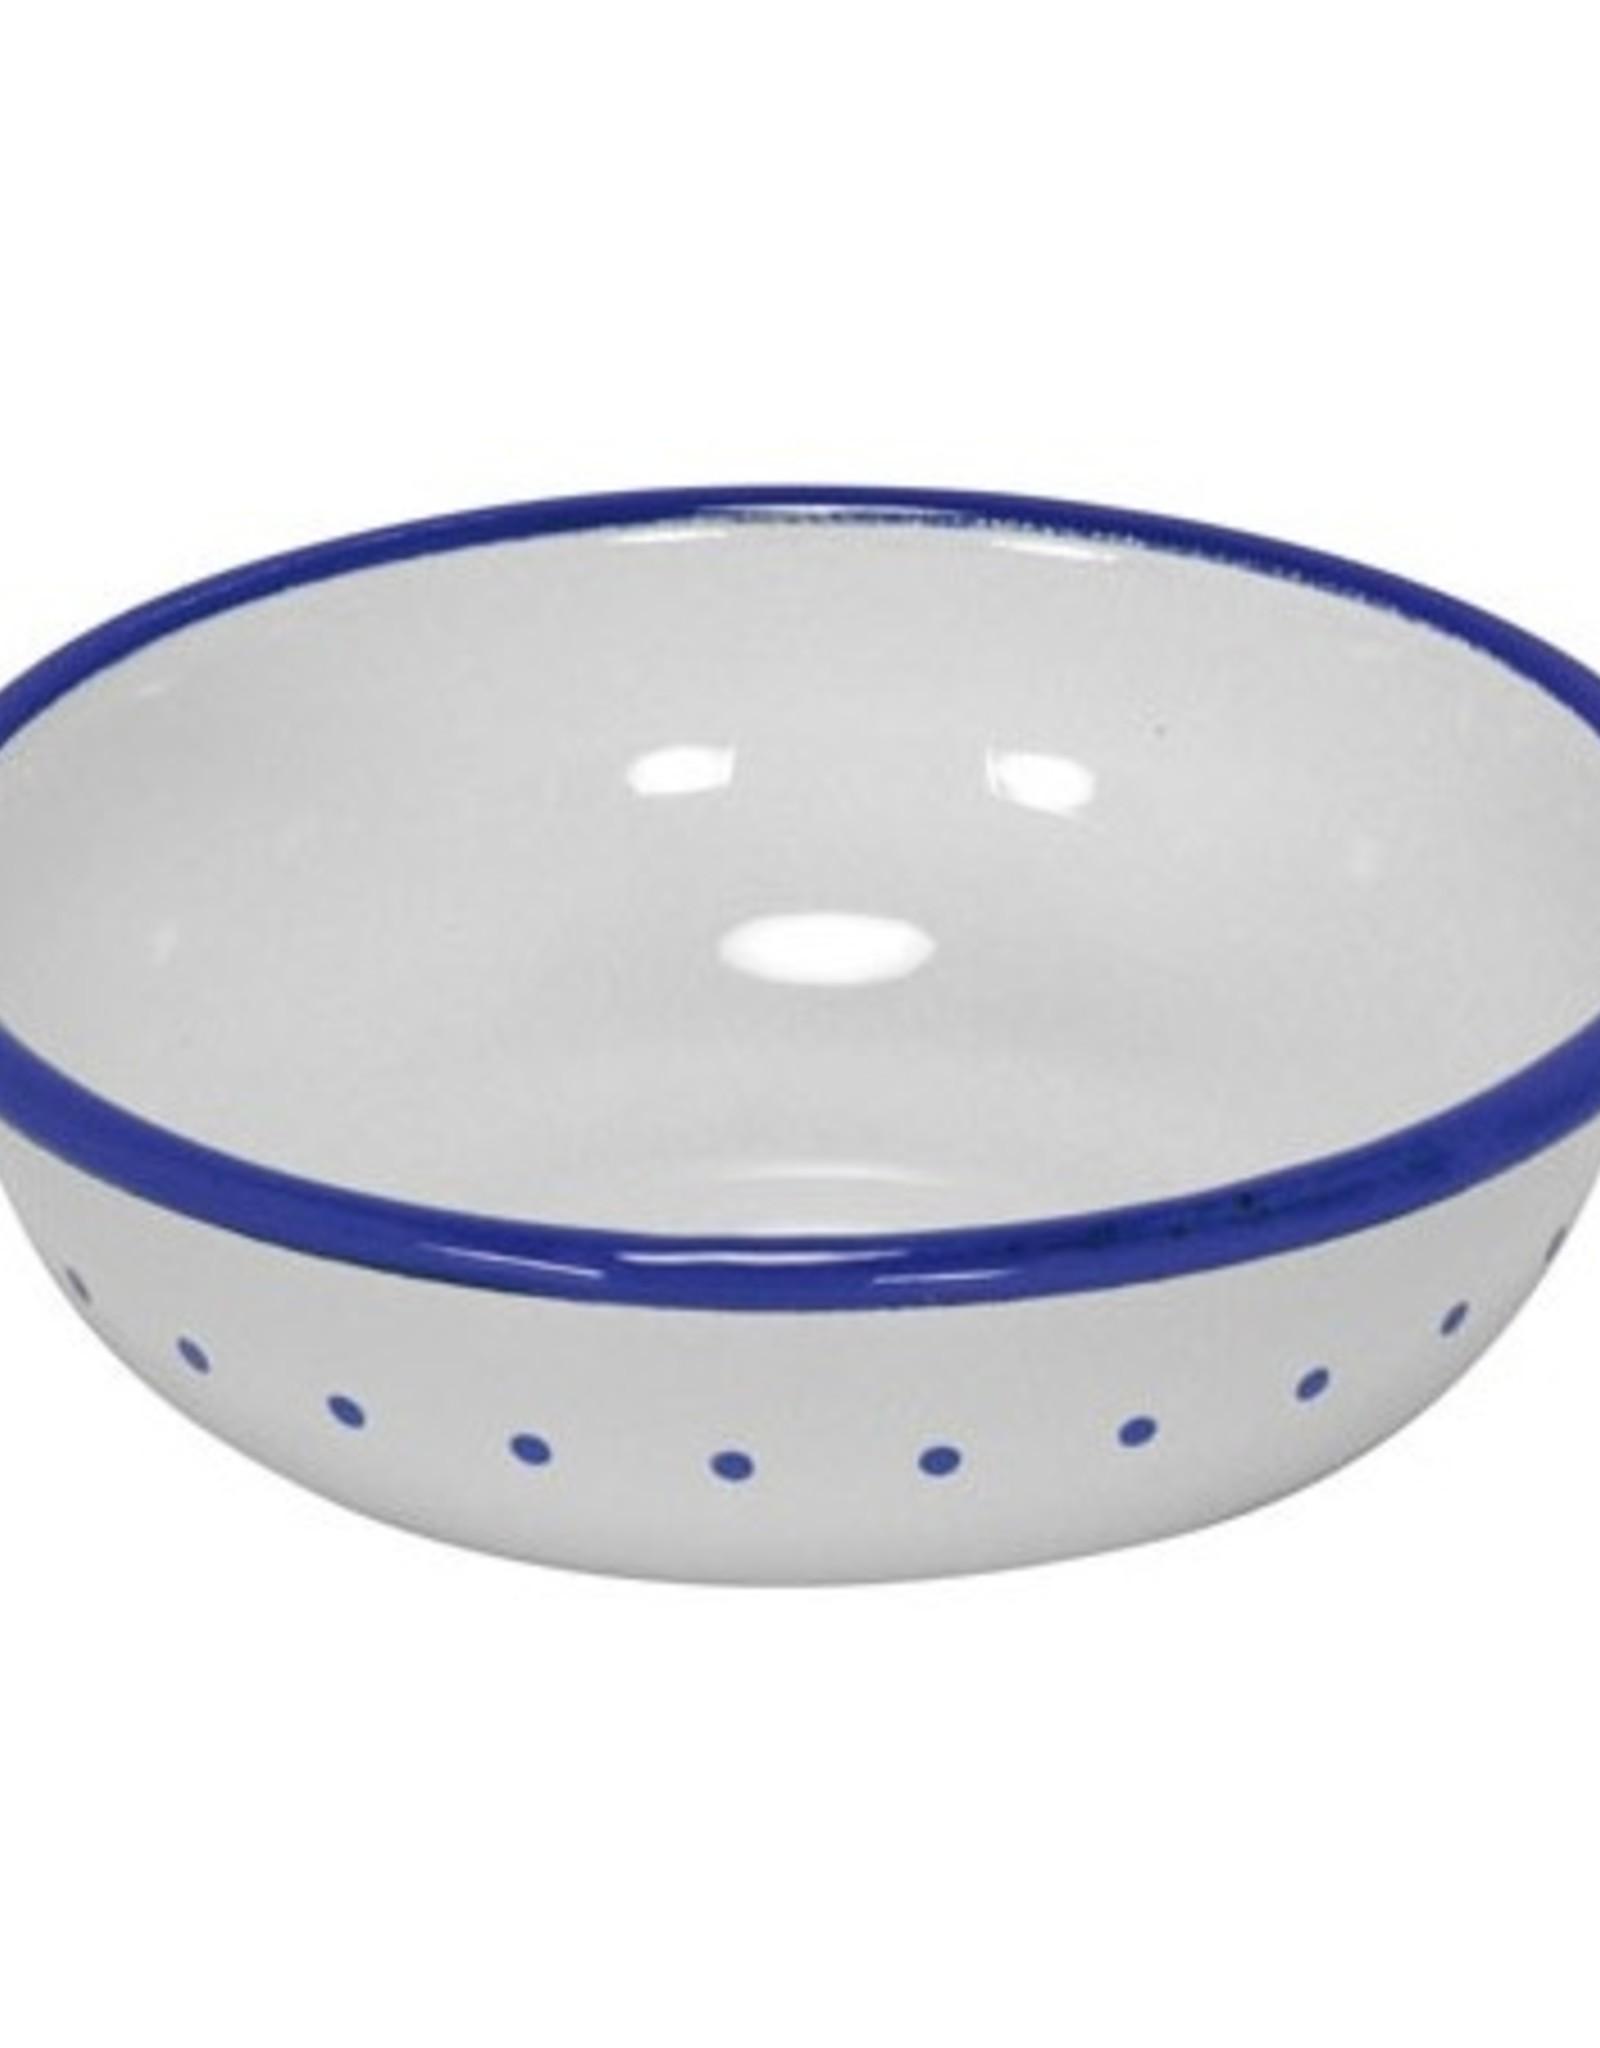 Gluckskafer Bowl